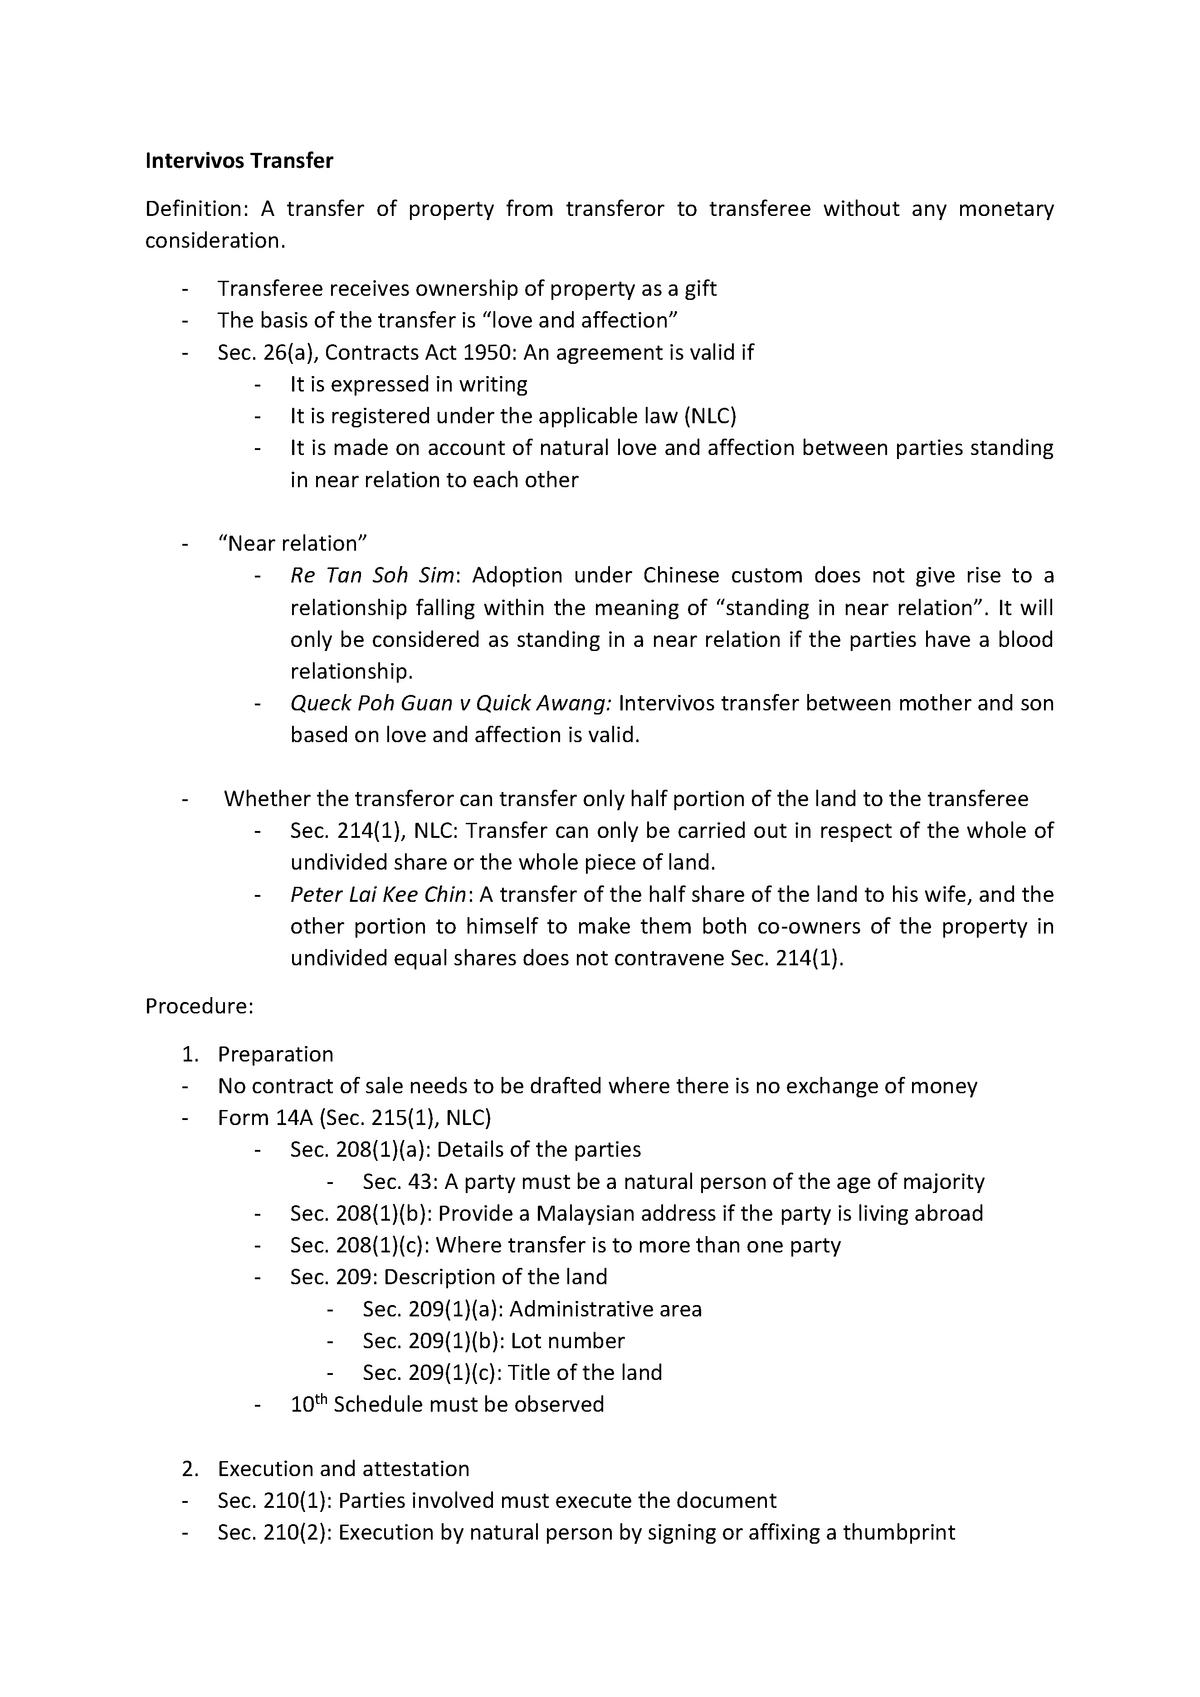 Law of Conveyancing - LAW512 - UiTM - StuDocu